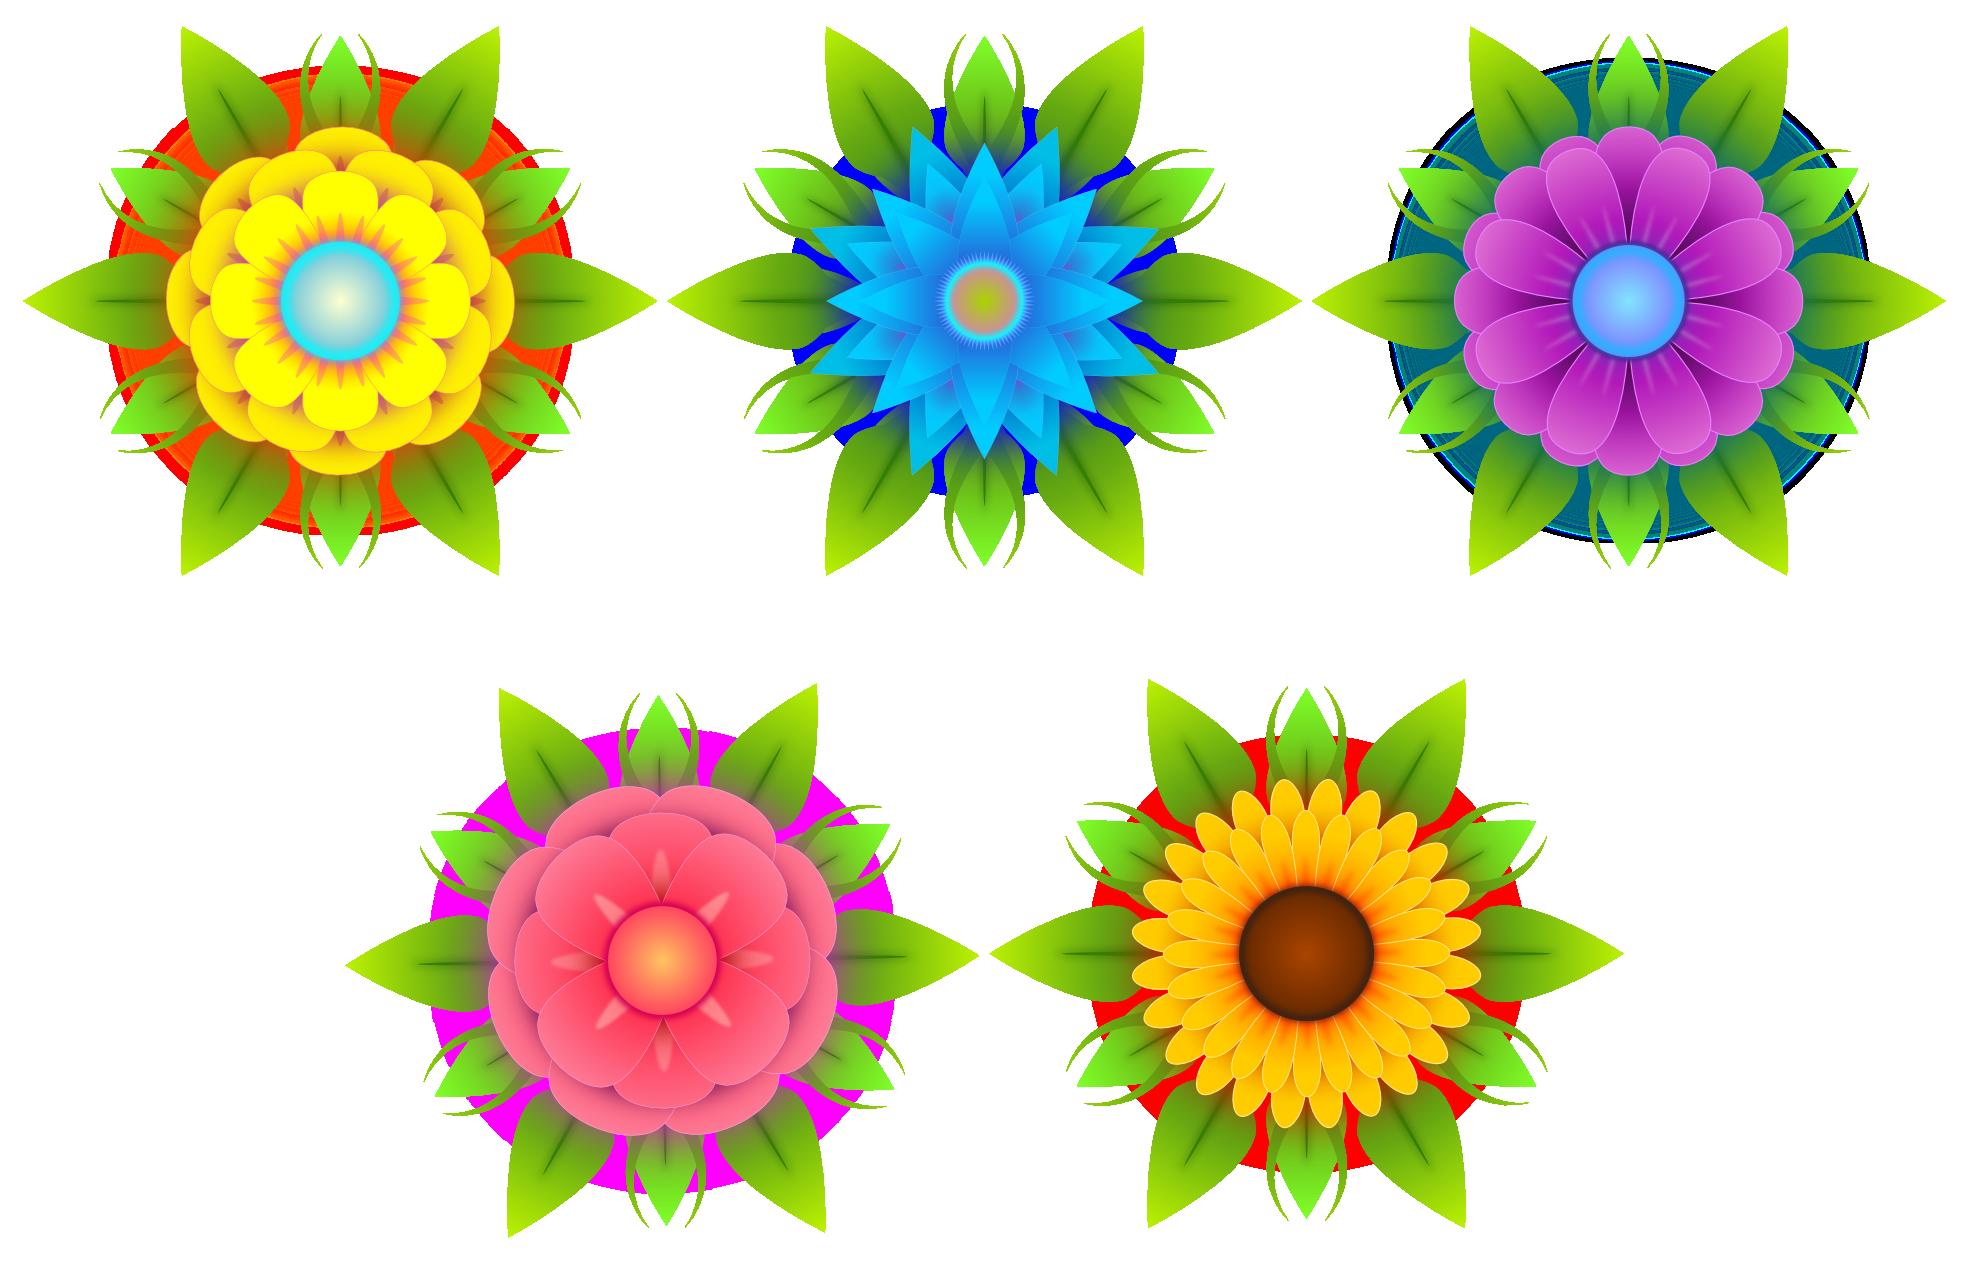 flower clip art flower images mycutegraphics - HD1280×806